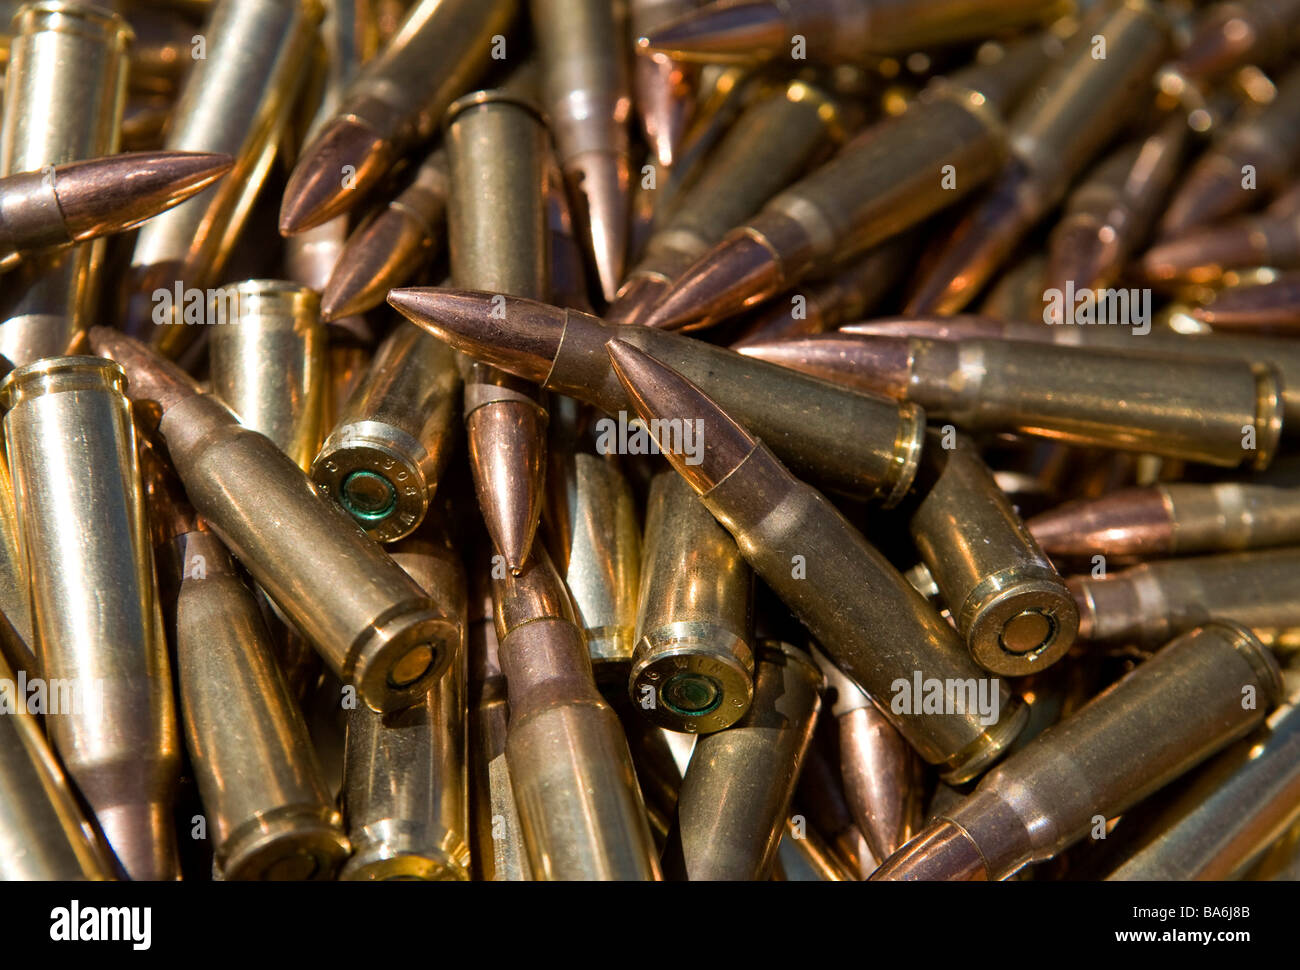 12 April 2009 Frederick Maryland Small caliber rifle ammunition An ammunition shortage has hit the United States - Stock Image